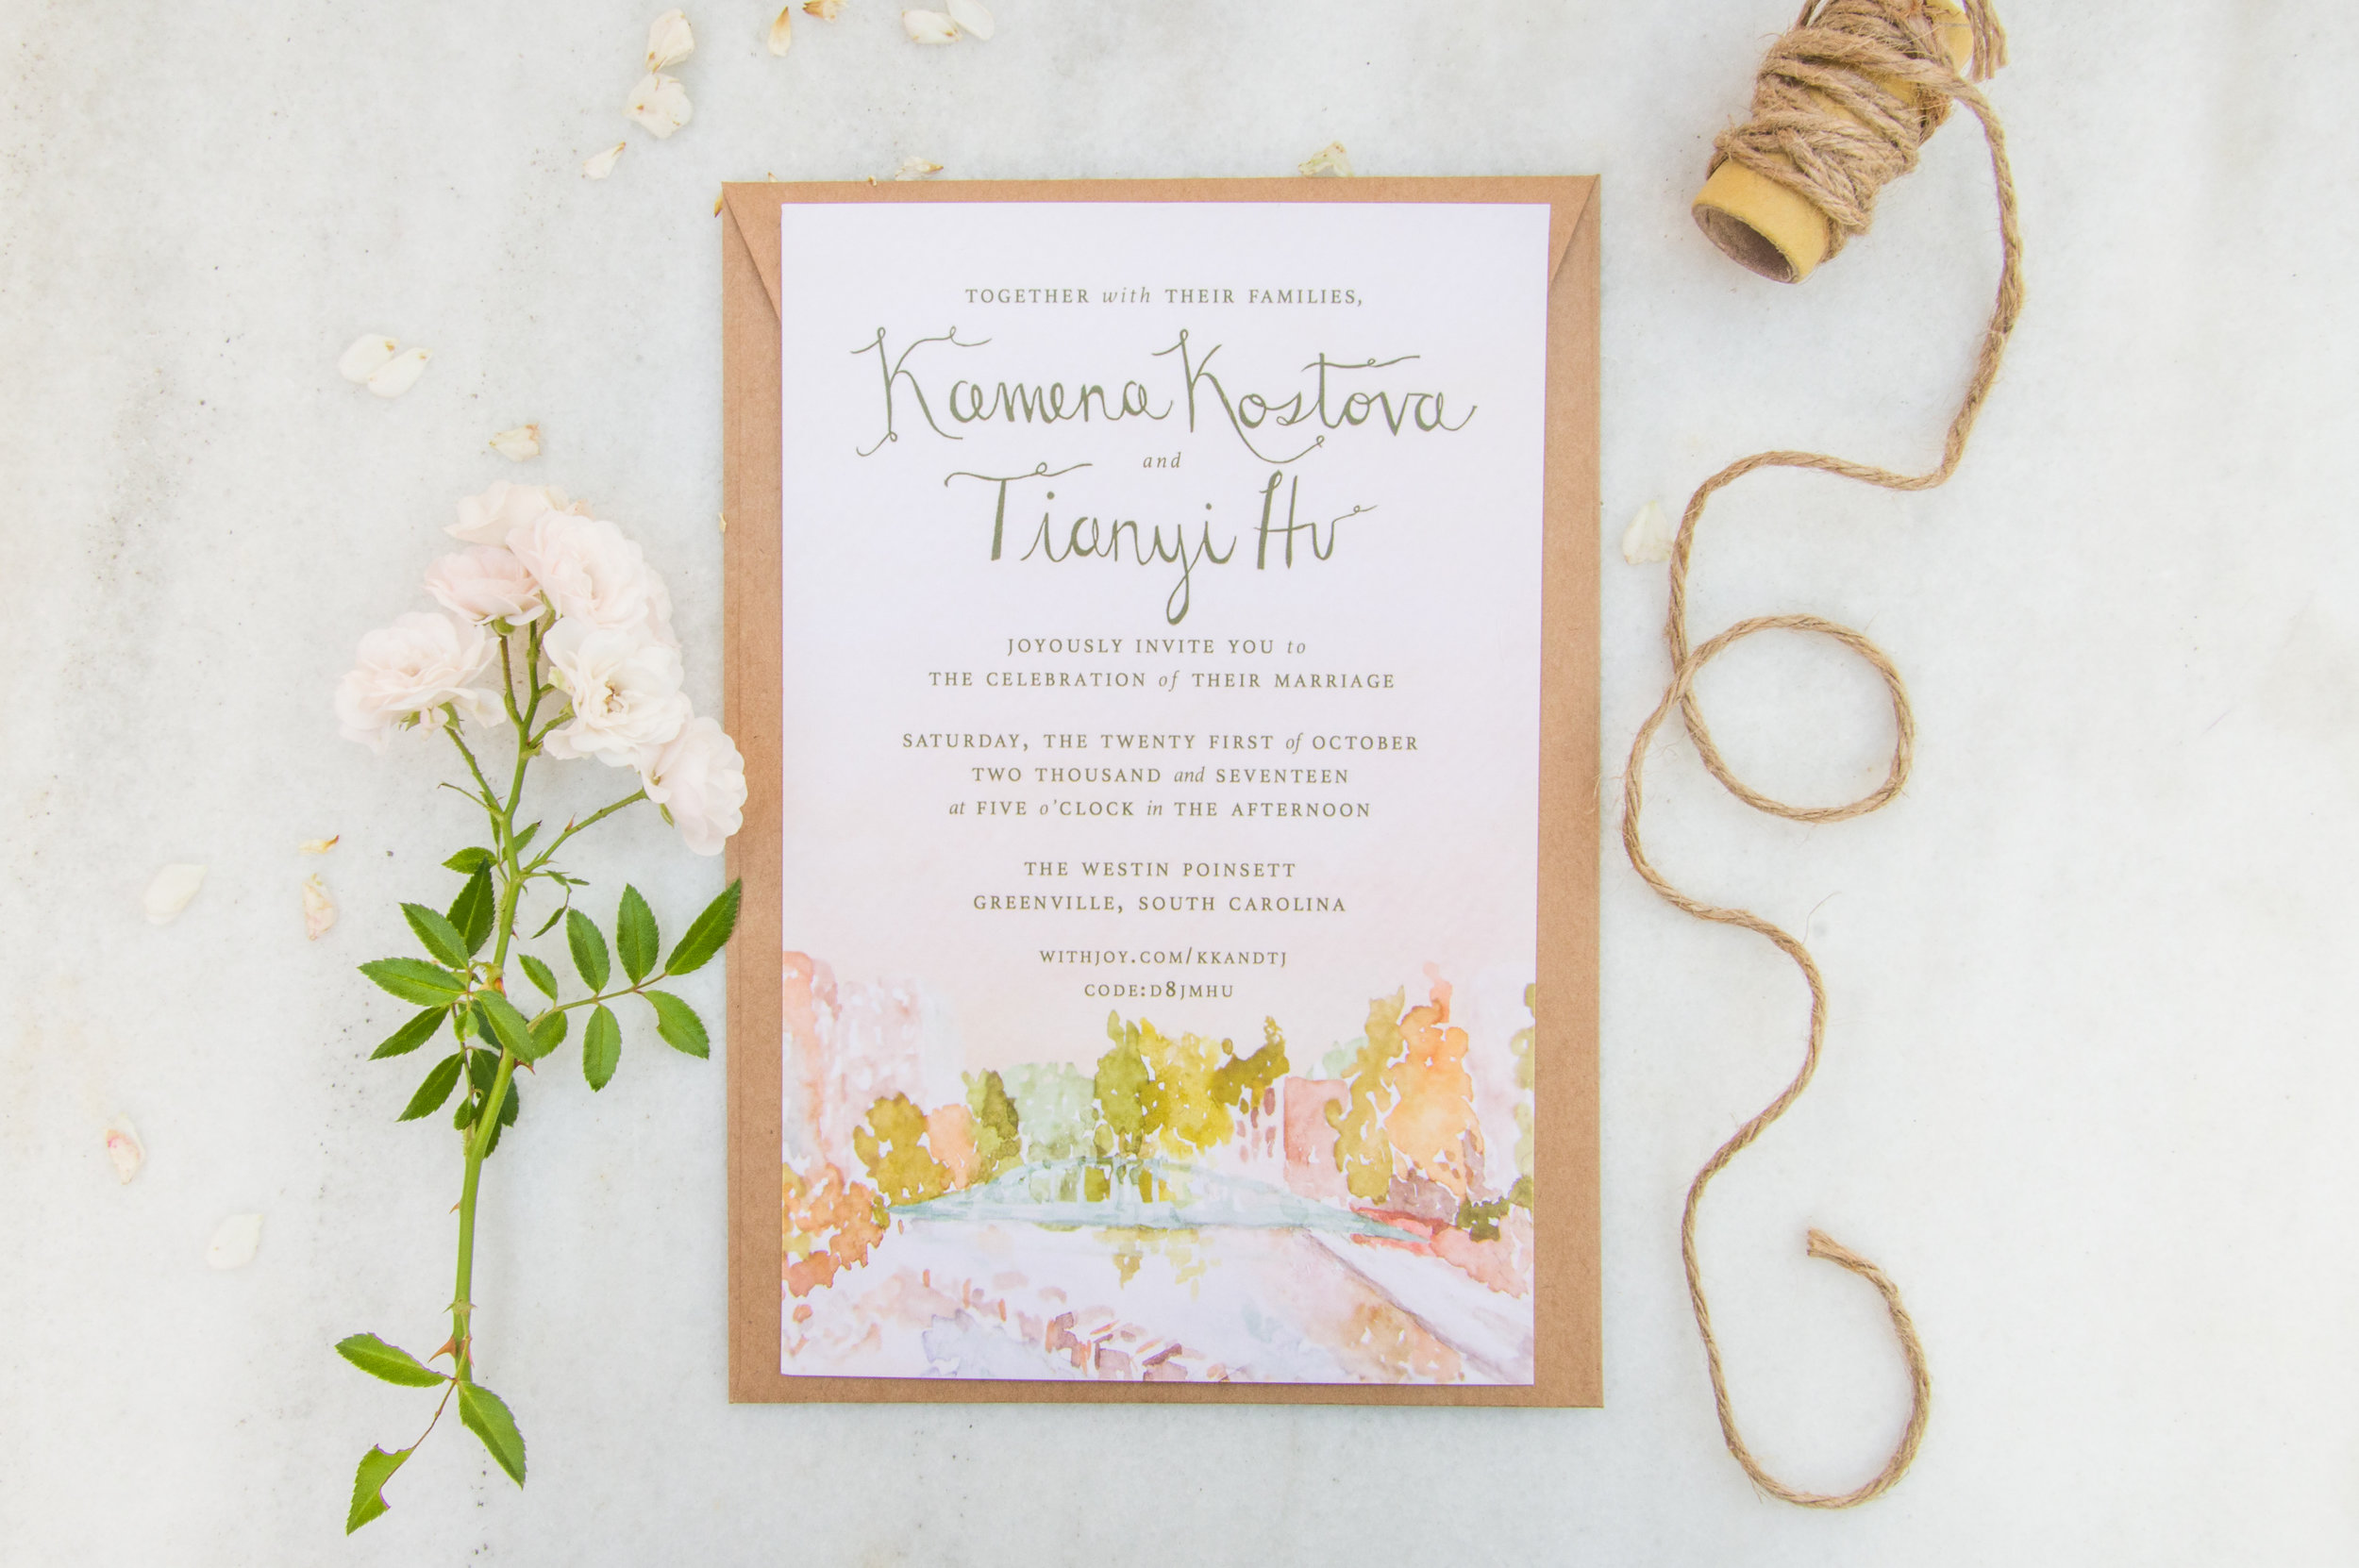 Greenville, South Carolina Bespoke Watercolor Wedding Invitation, 2017.